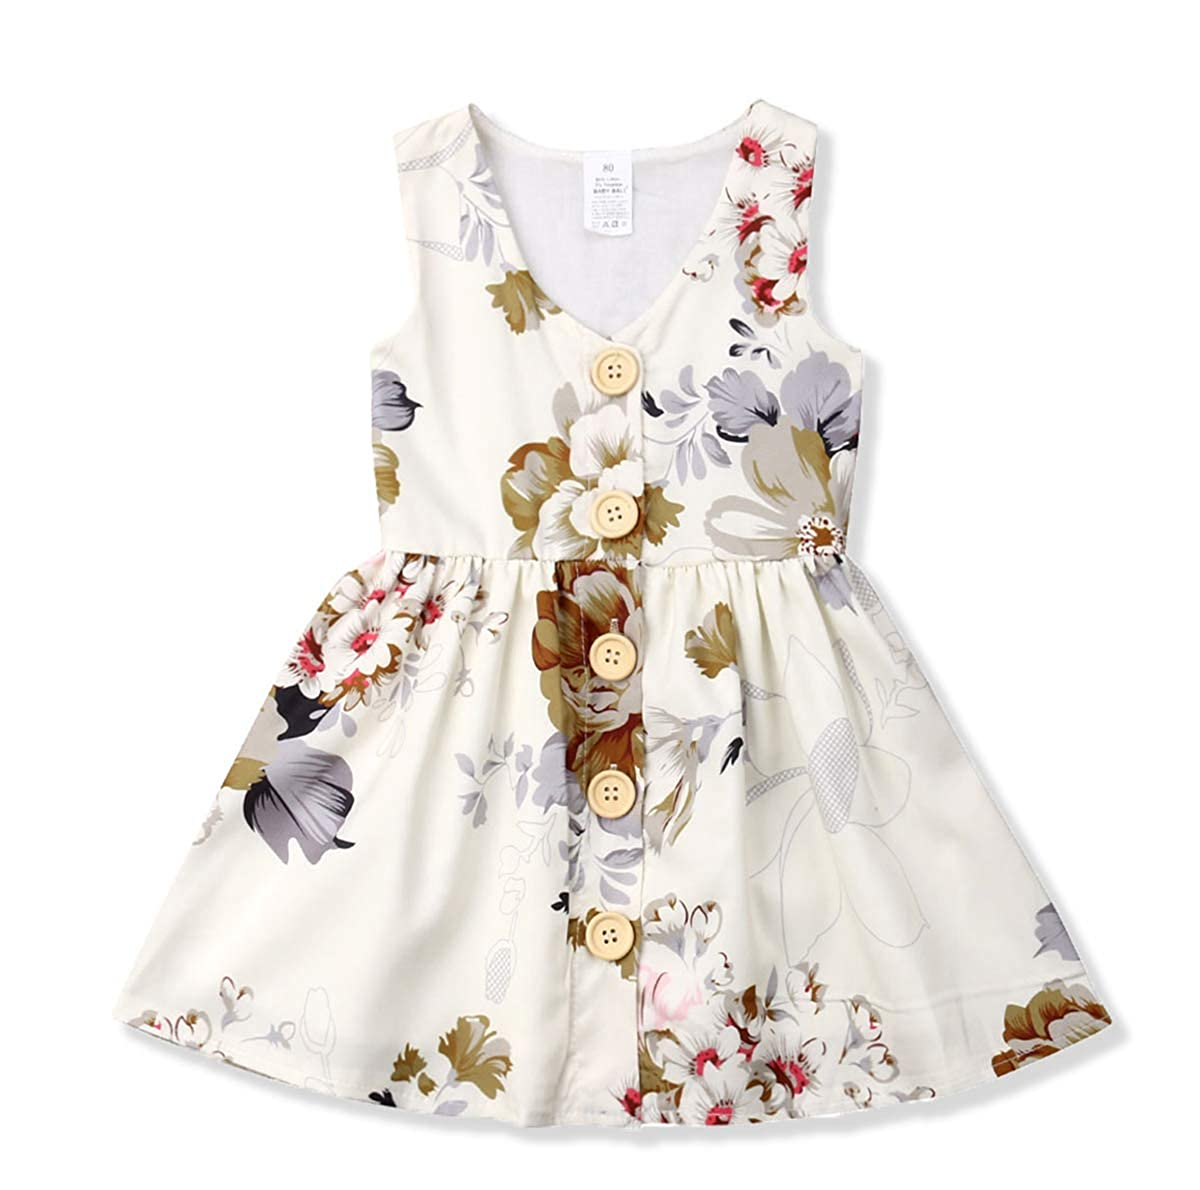 f9b82b695fdf Amazon.com  Toddler Baby Girl Dress Princess Floral Skirt Sleeveless ...